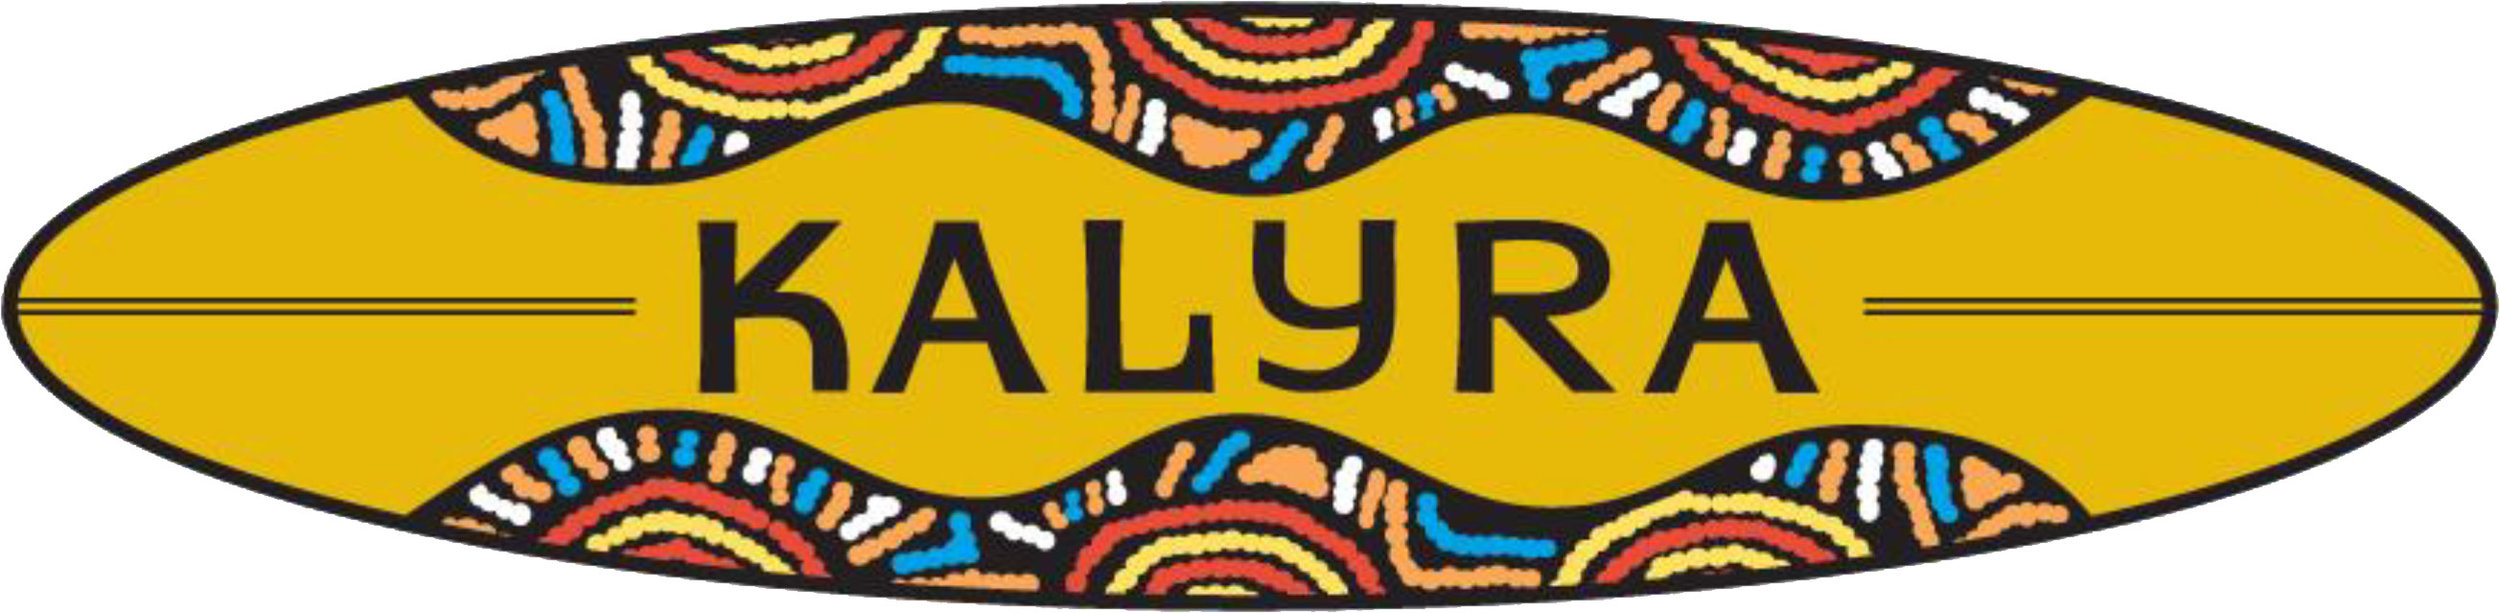 Kalyra Logo Only (no box).jpg